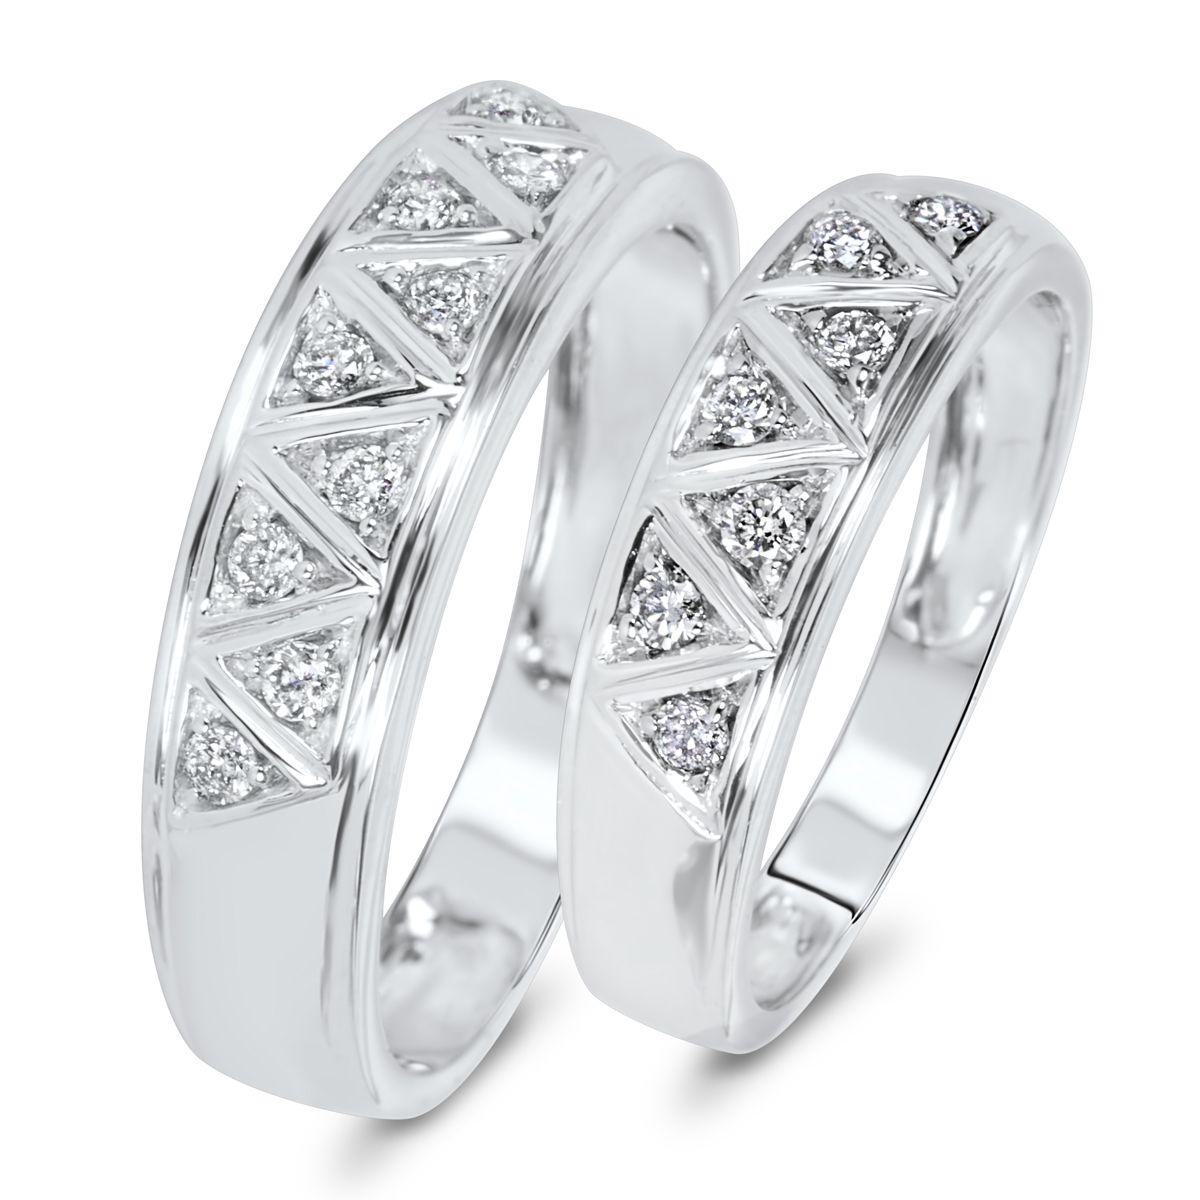 13 carat tw diamond his and hers wedding band set 14k